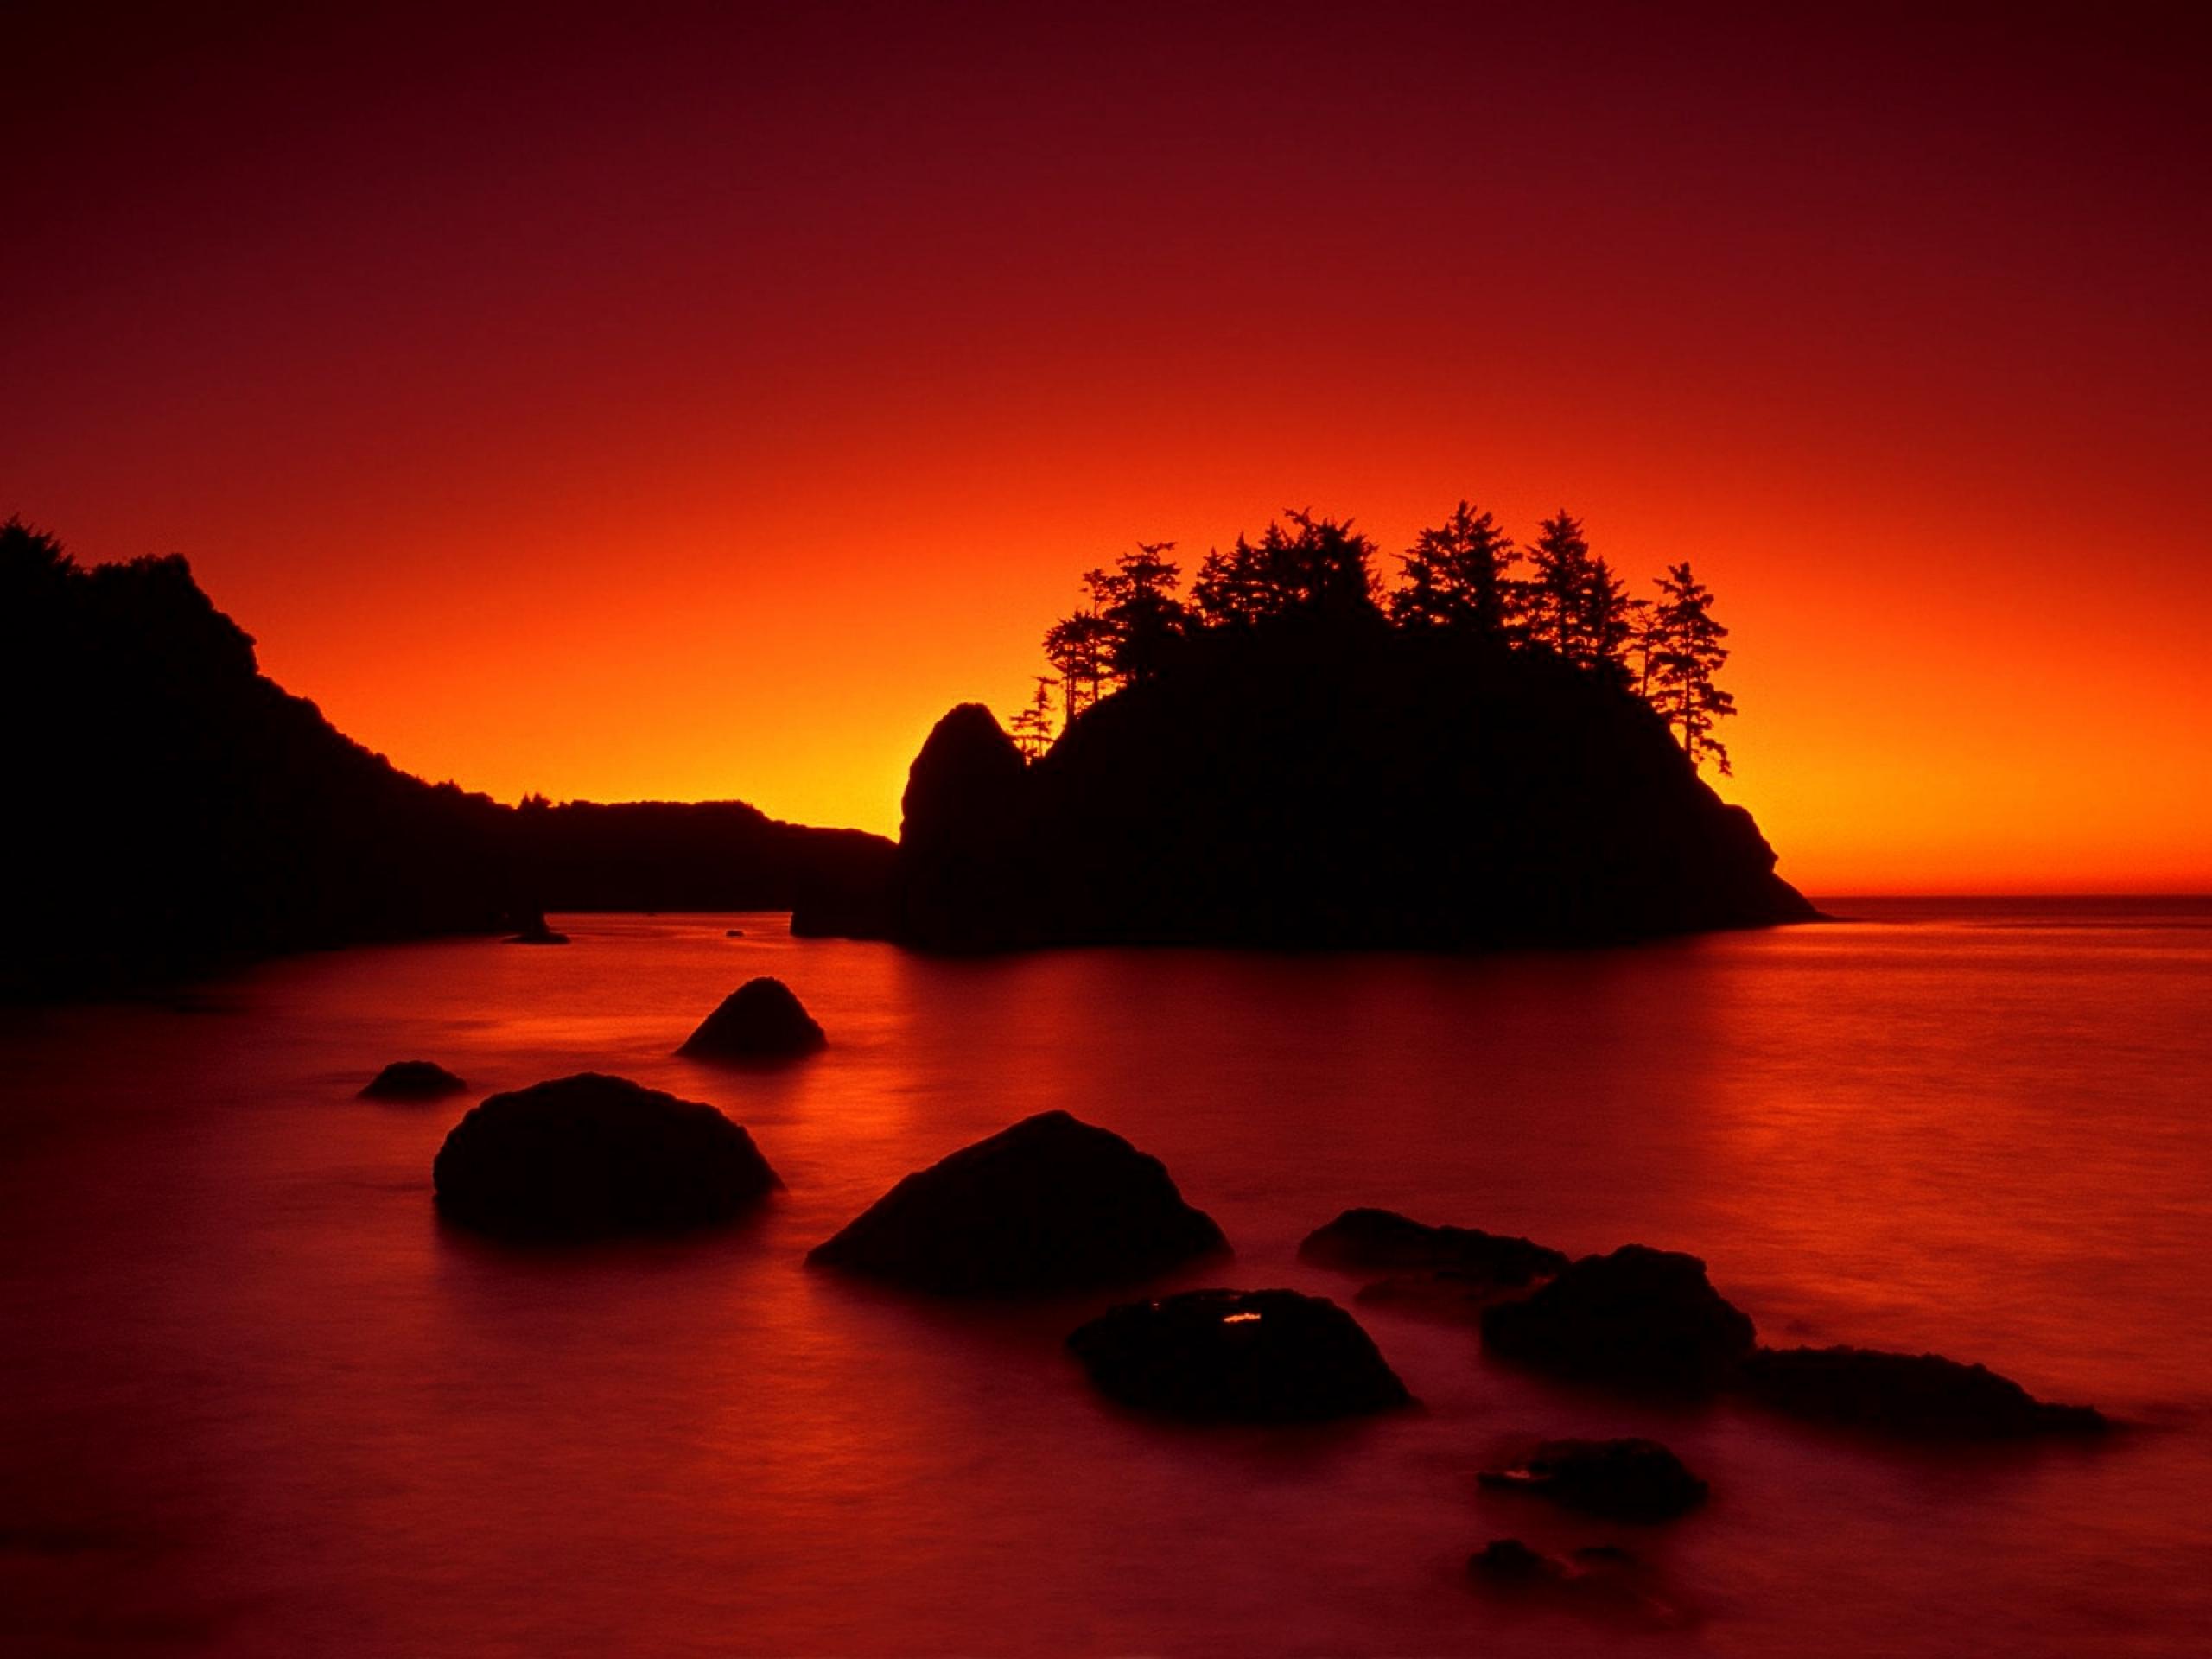 Sunset Ocean Dark Island wallpapers Red Sunset Ocean Dark Island 2560x1920